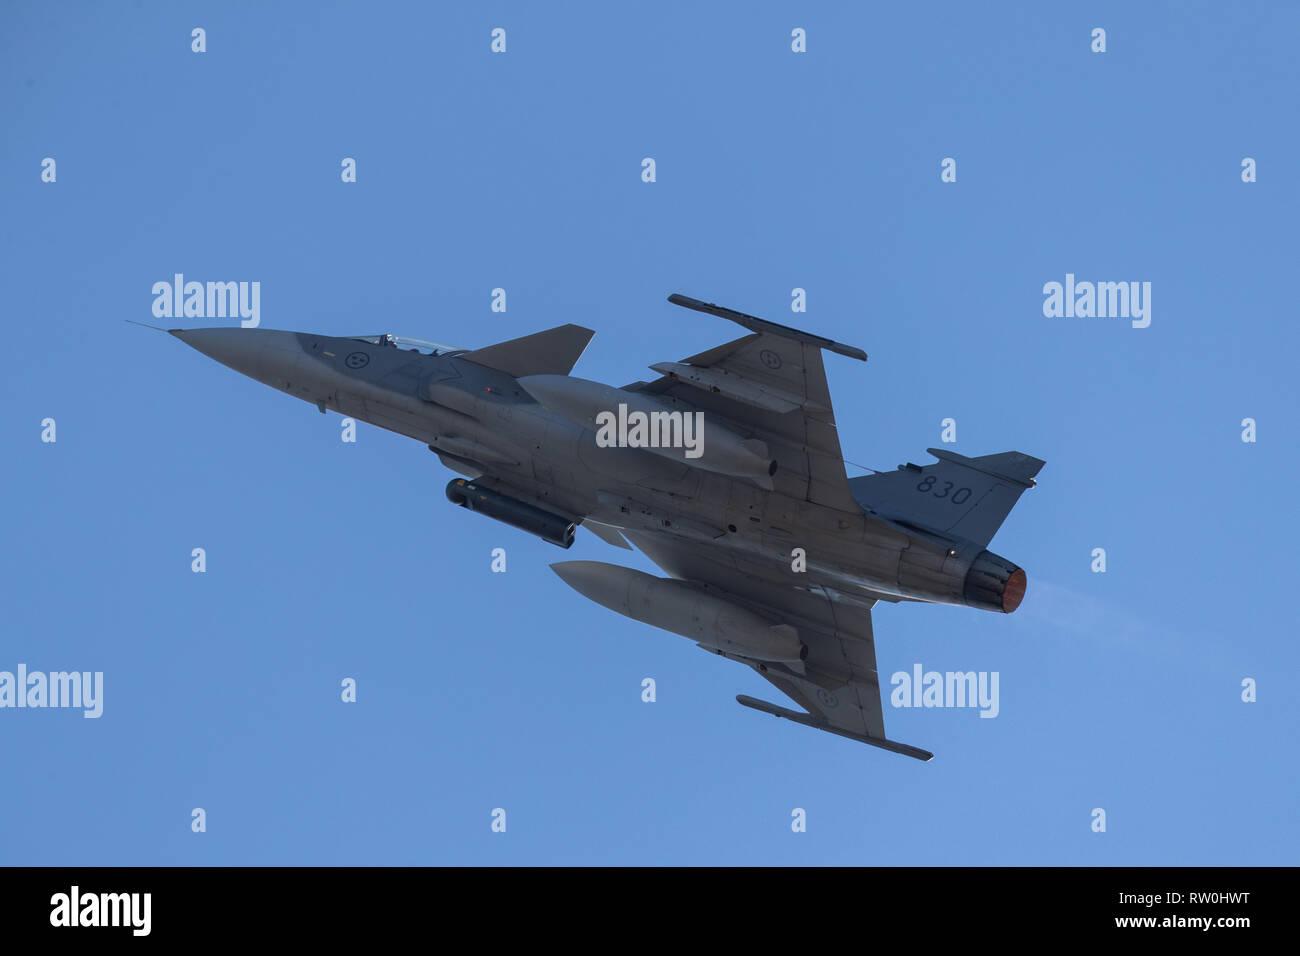 Saab JAS 39 Gripen is a Swedish built 4th generation single engine